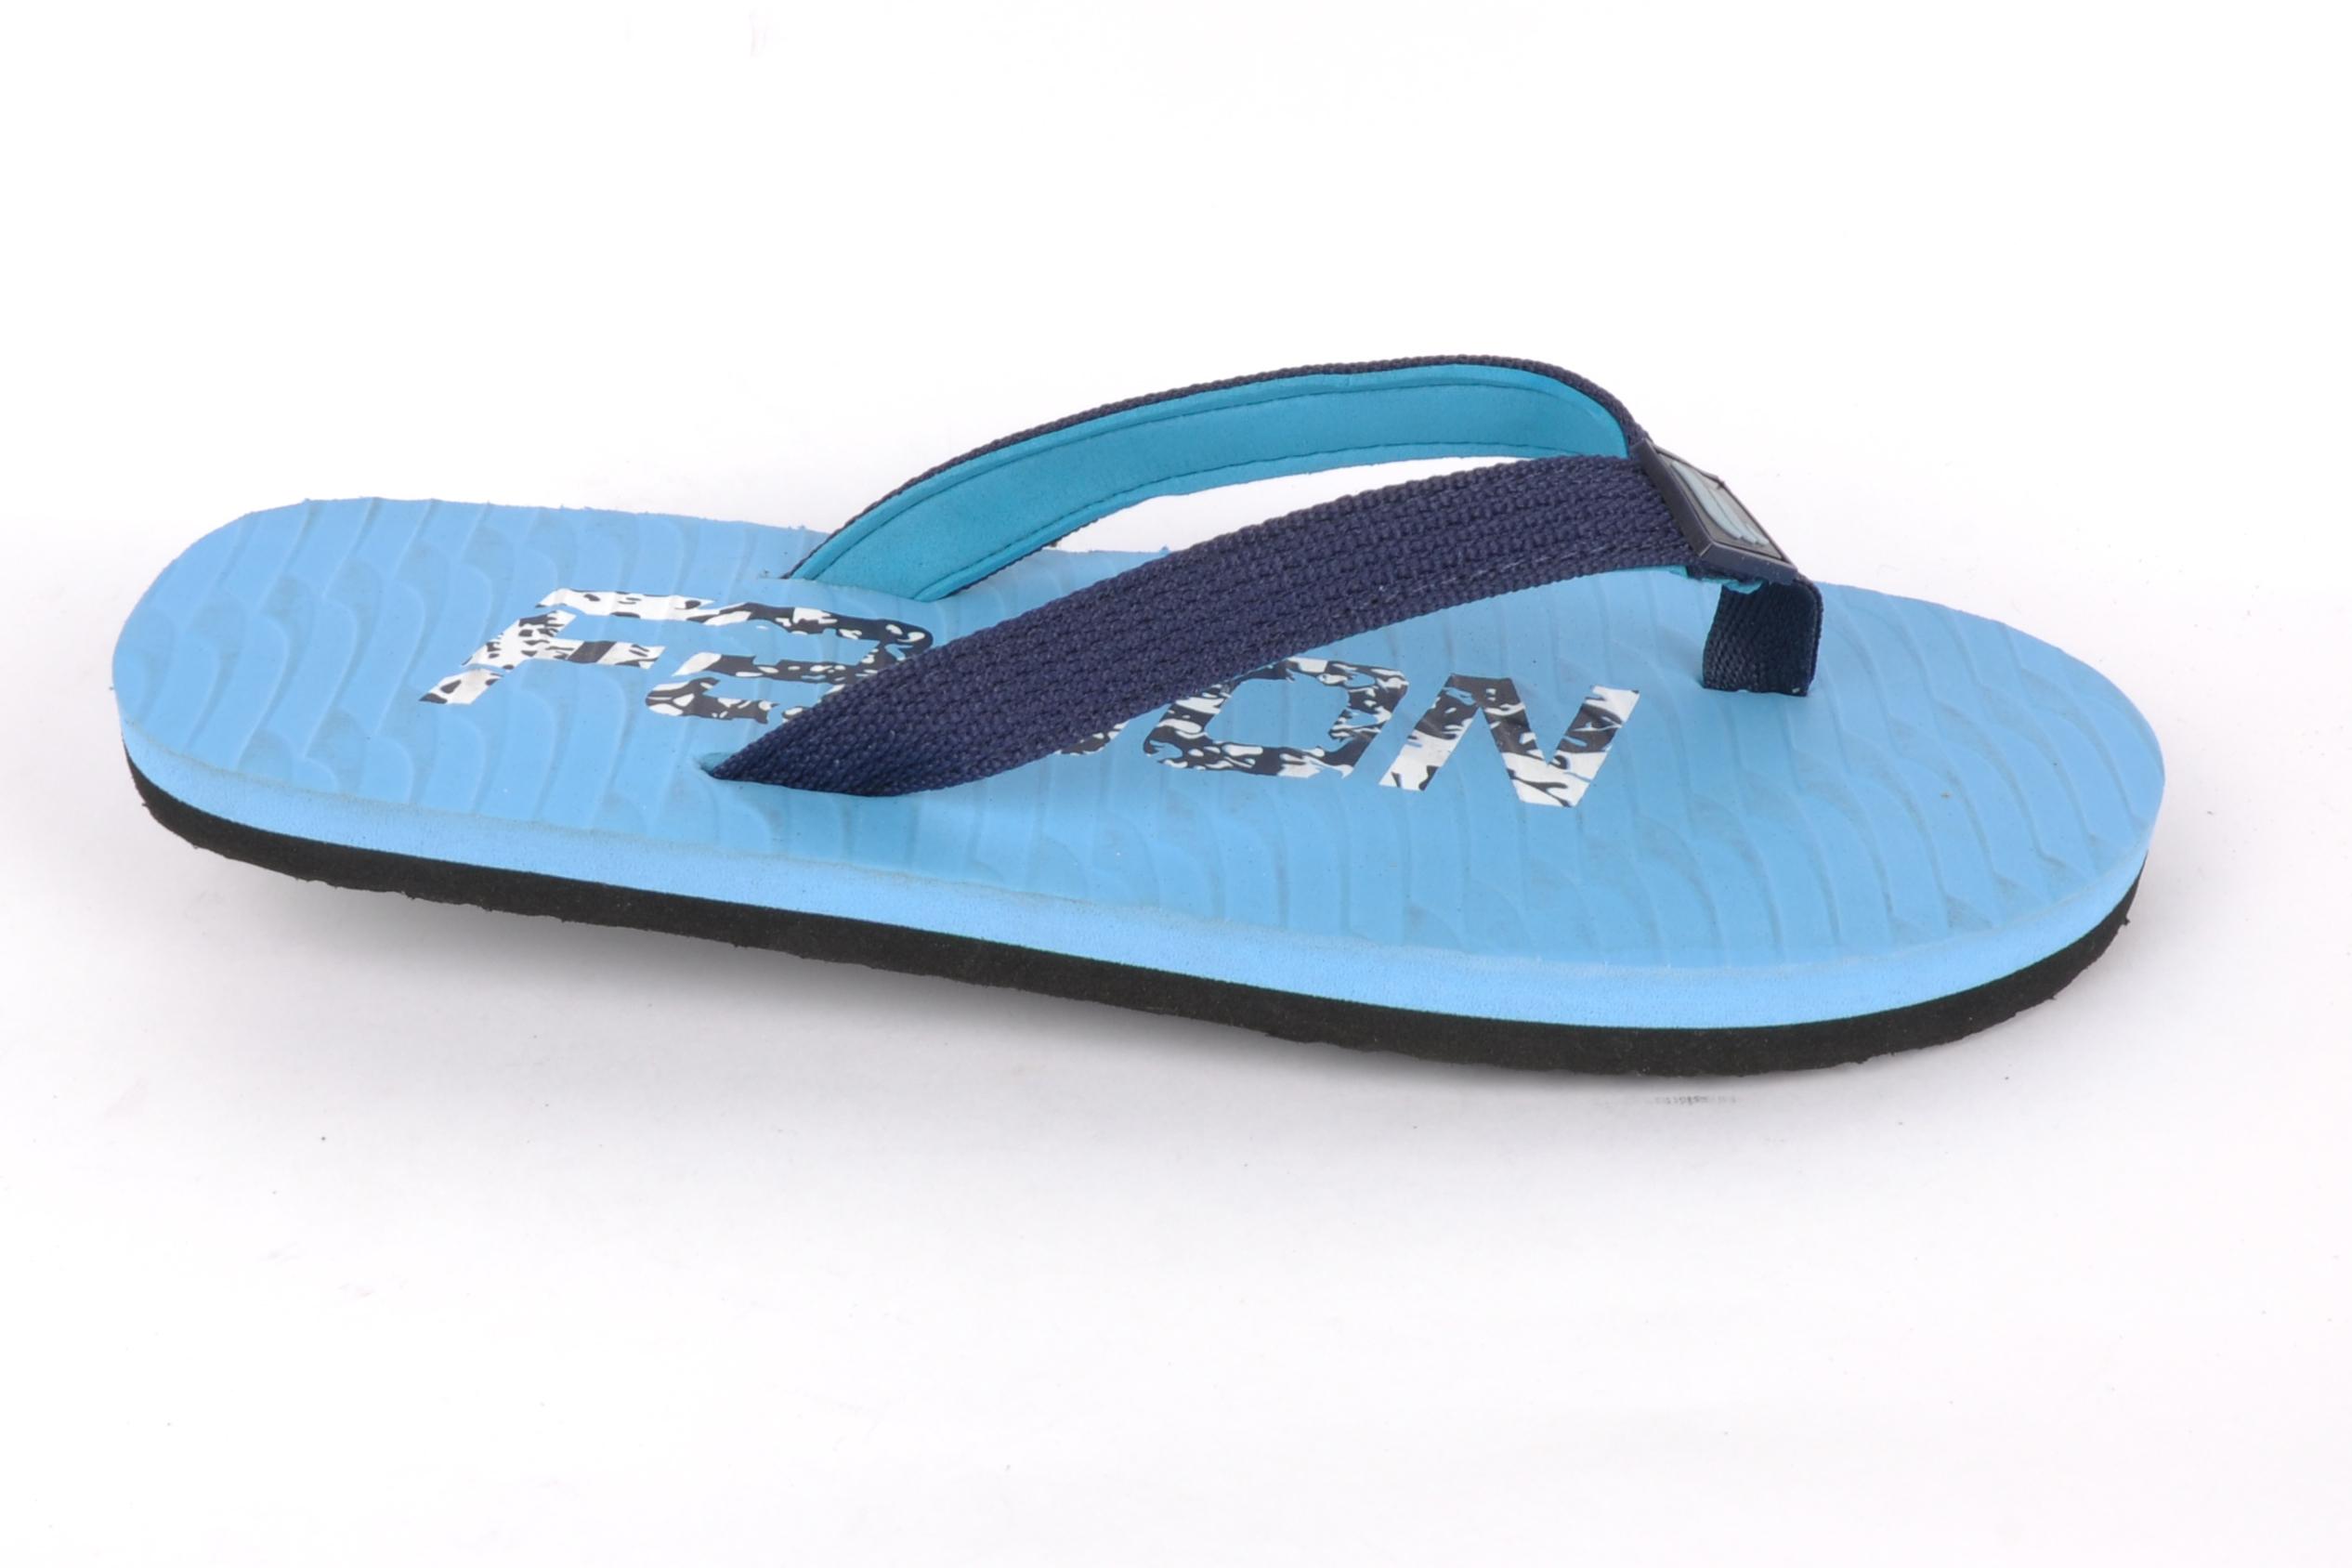 Sky Blue Flip Flop Slipper